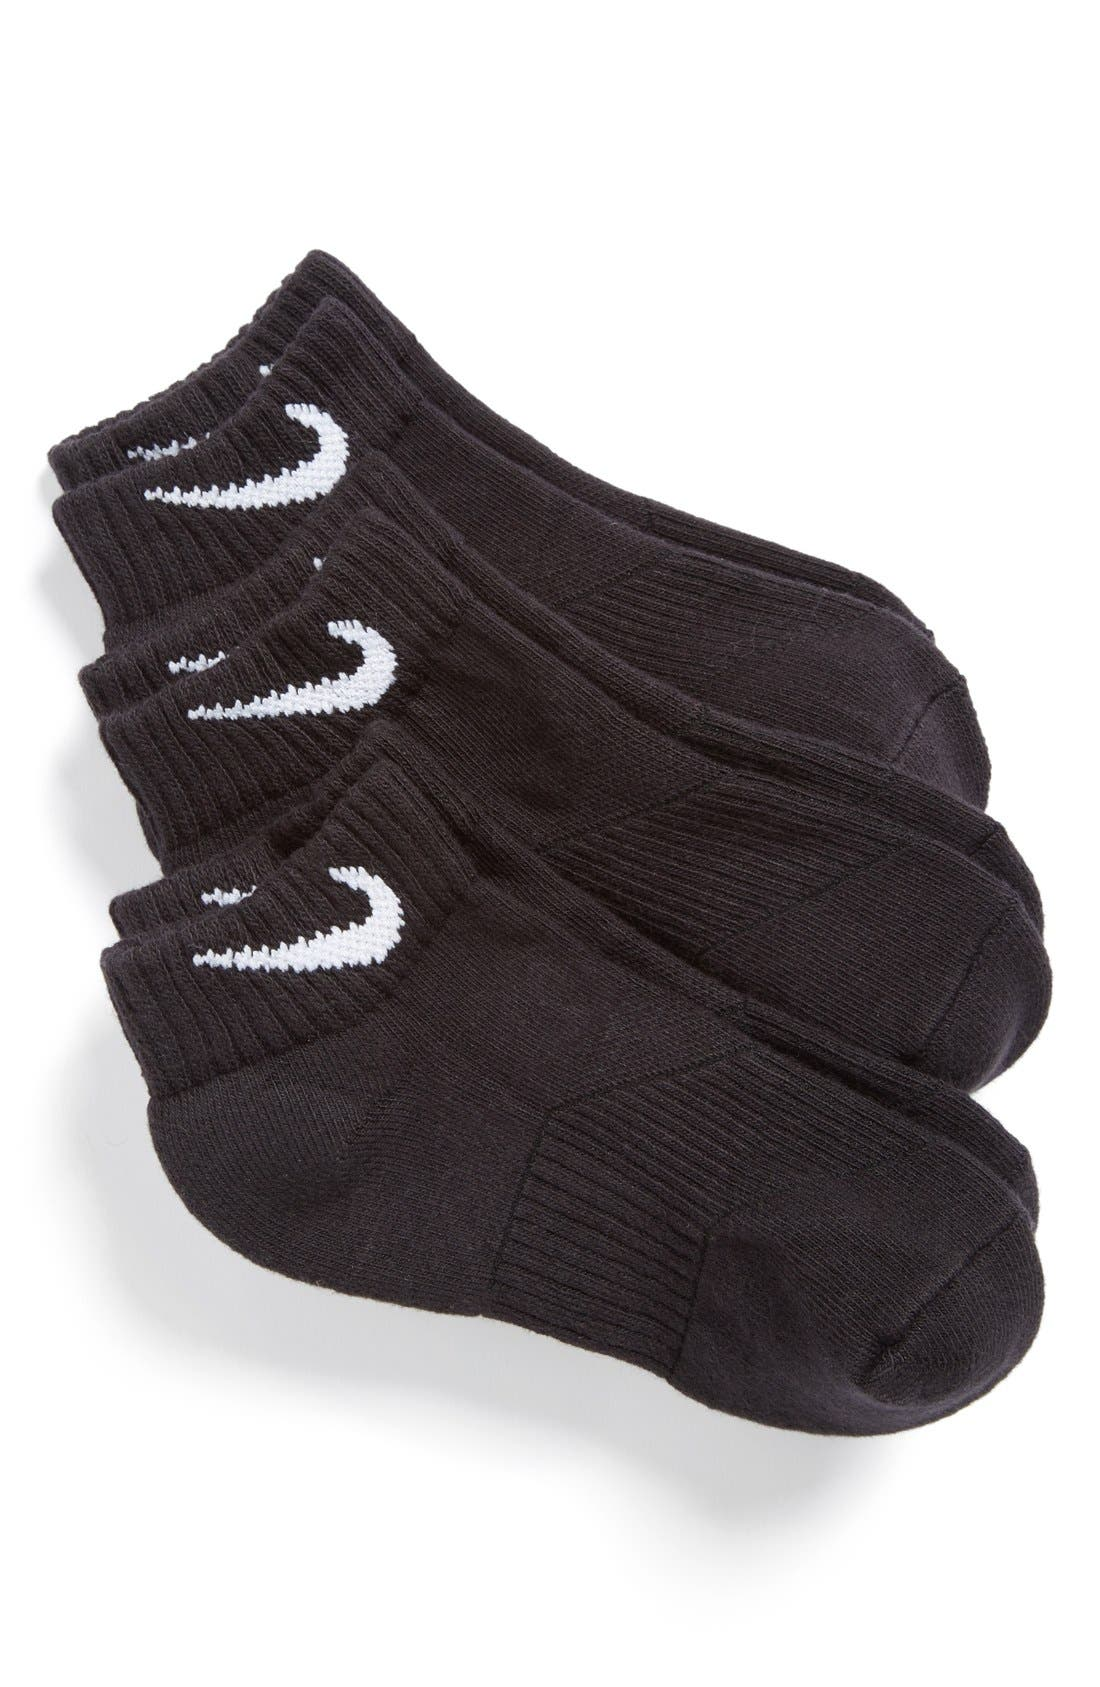 Nike 3-Pack Cushioned Low Cut Socks (Walker, Toddler, Little Kid & Big Kid)